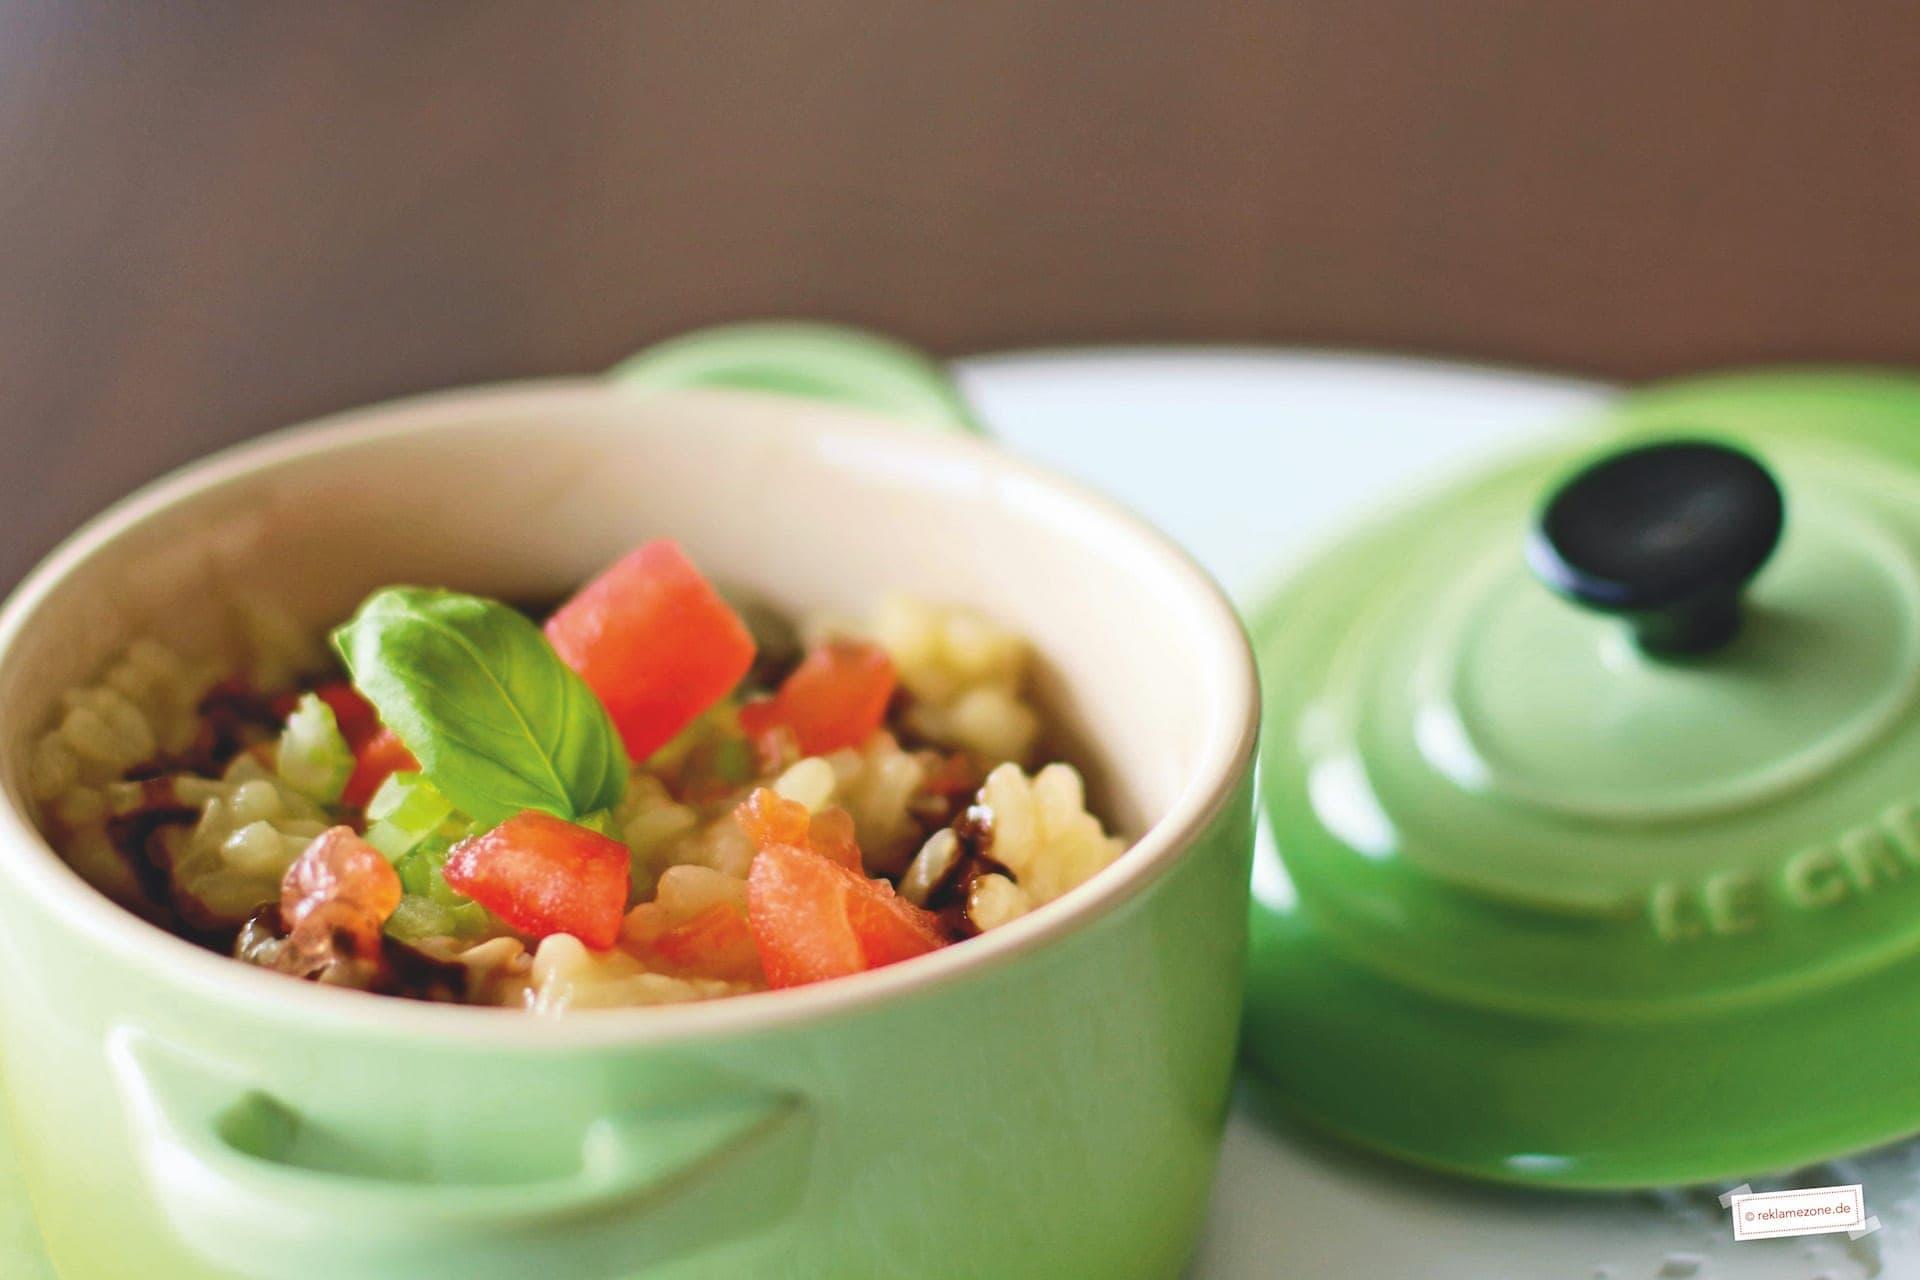 Reisgerichte, Gemüserisotto - Foto: reklamezone.de